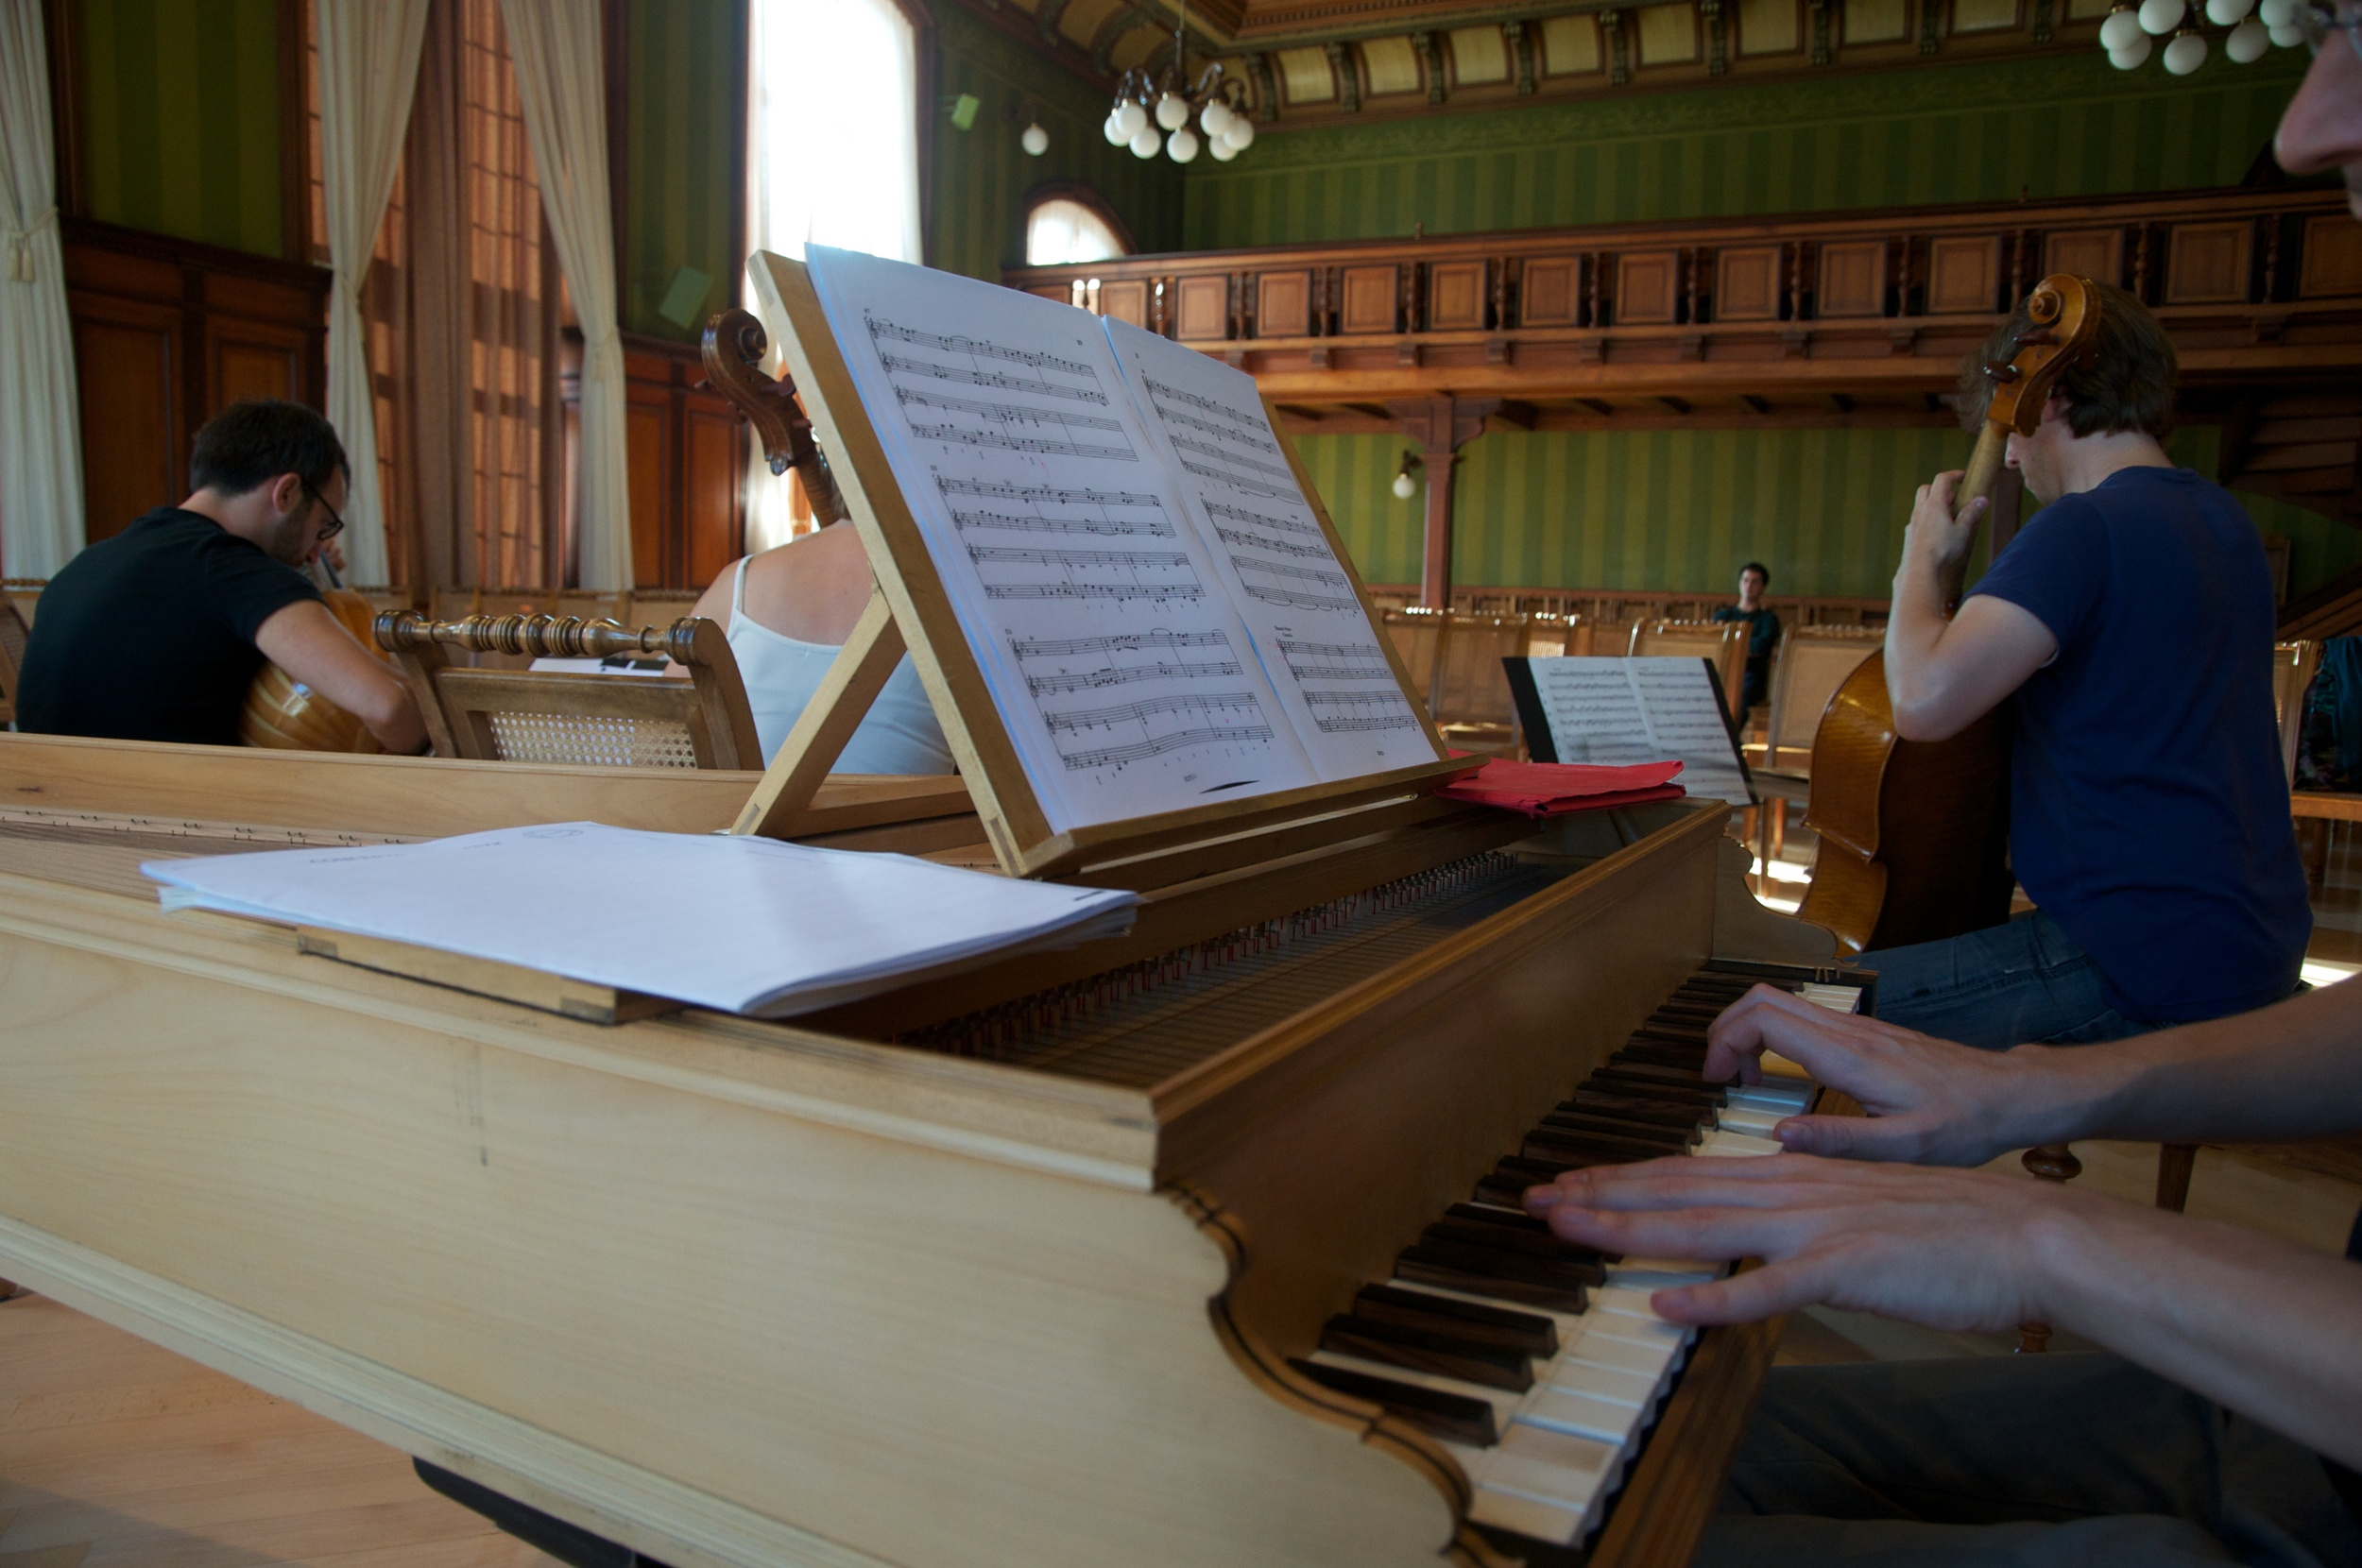 """Basso solo"" im Rathaussaal Weinfelden"